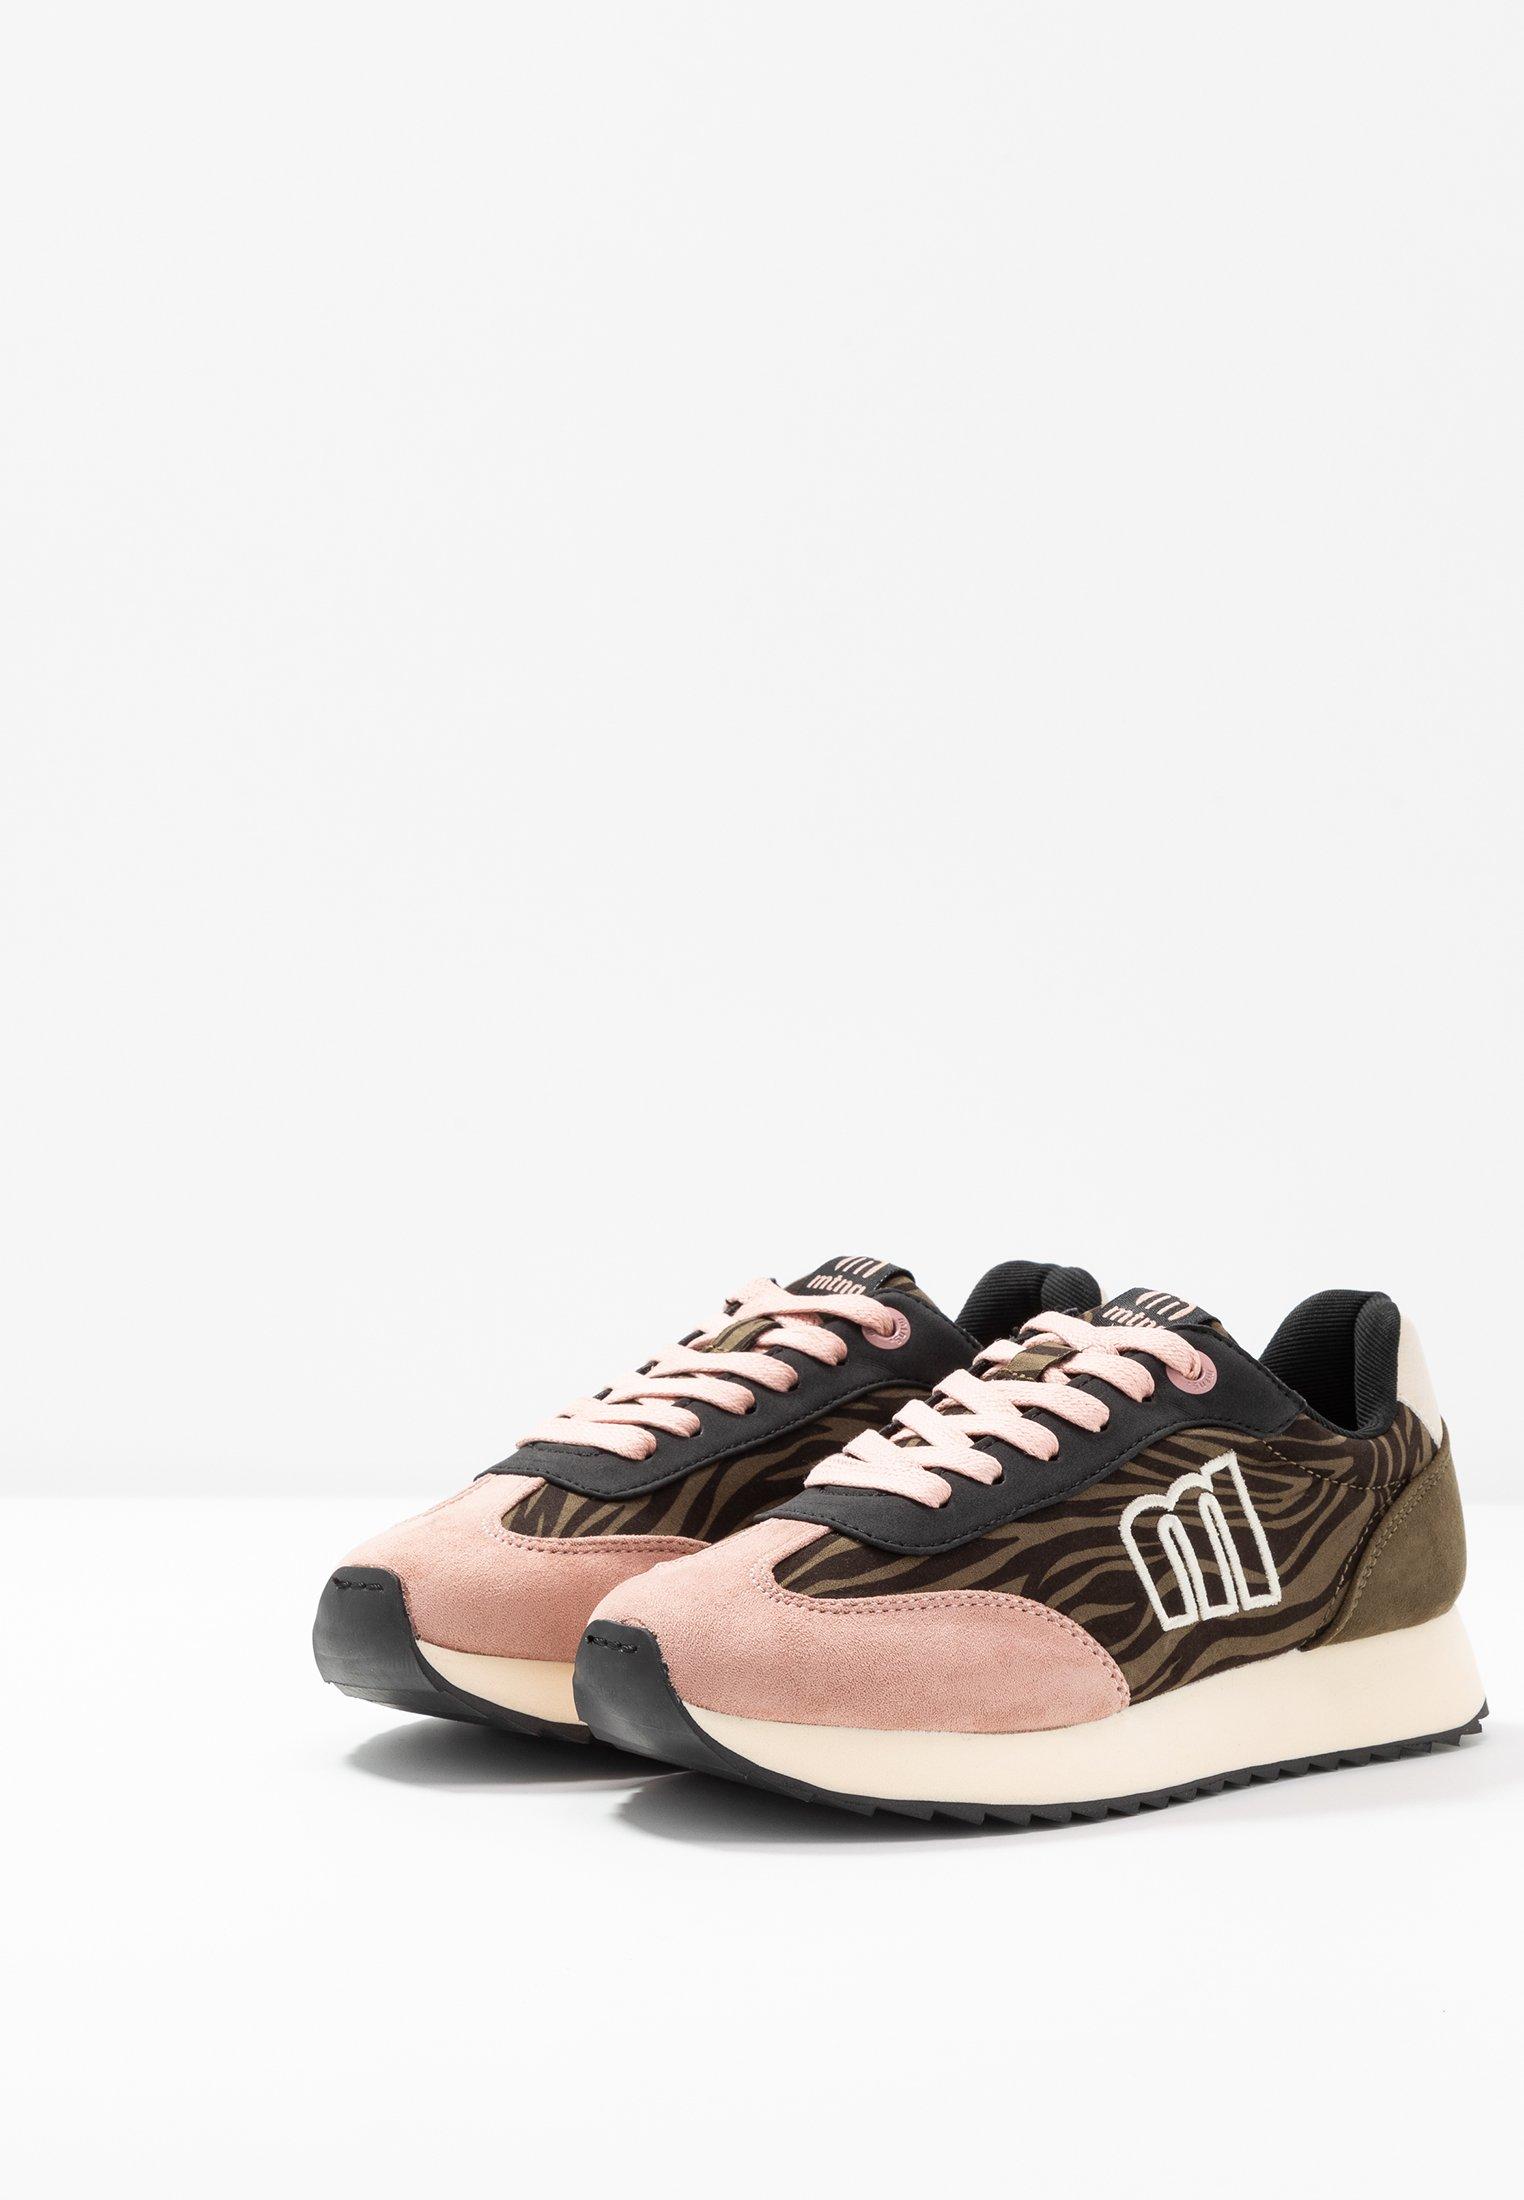 Natural NoraSneakers Basse Rosa Soft kaky Mtng yoda TKcJFl13